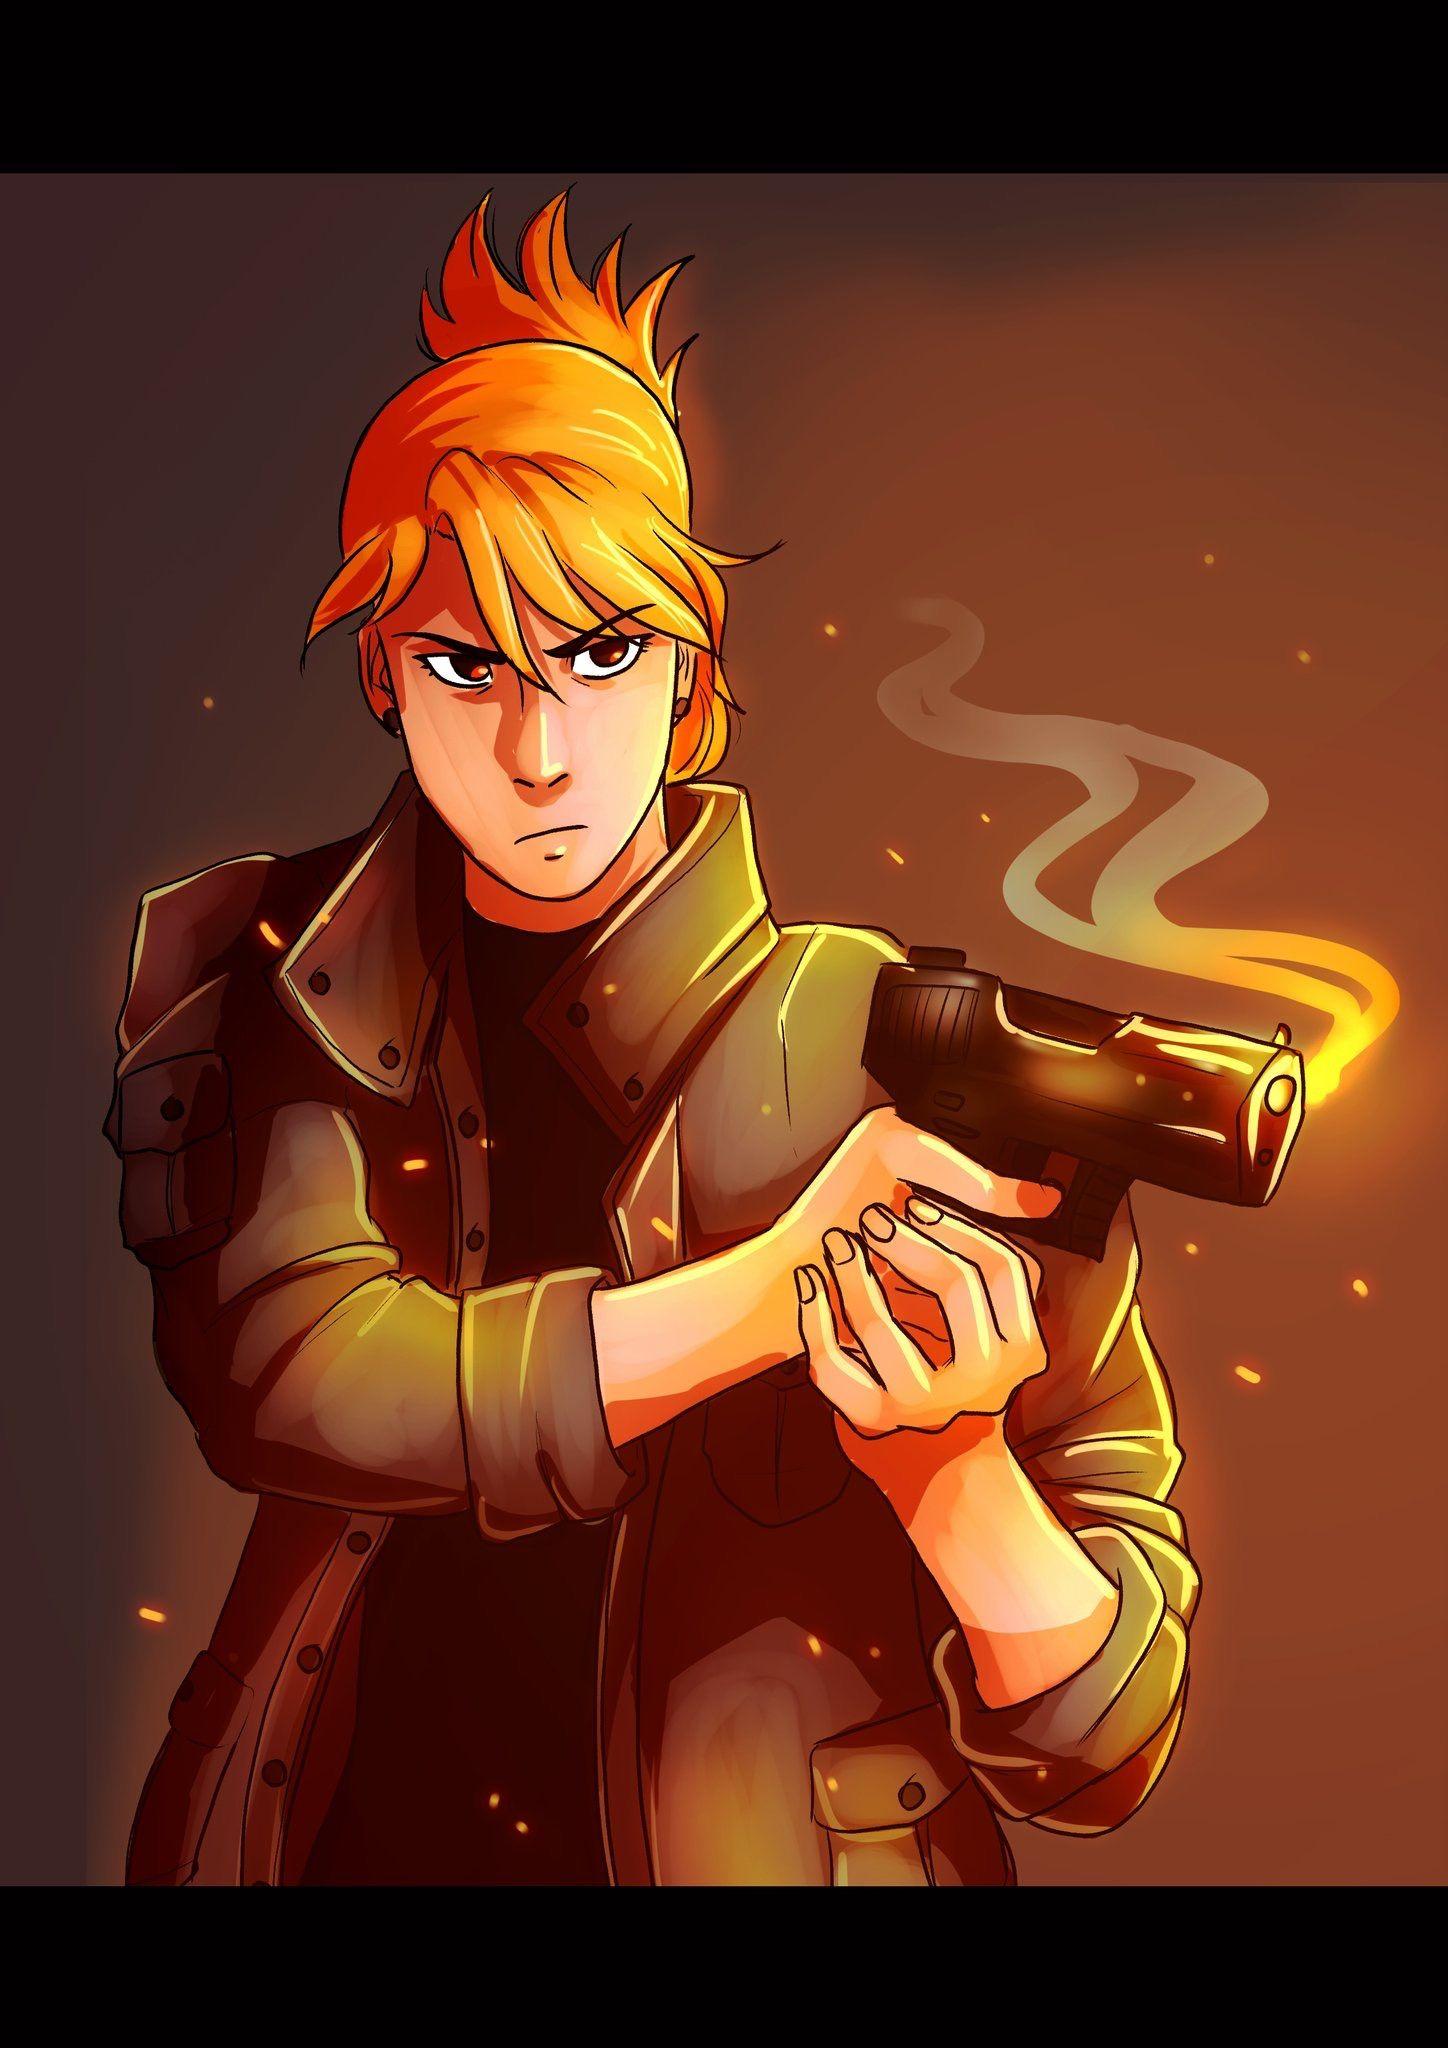 Kinschi_drwas Fullmetal alchemist, Ghost in the shell